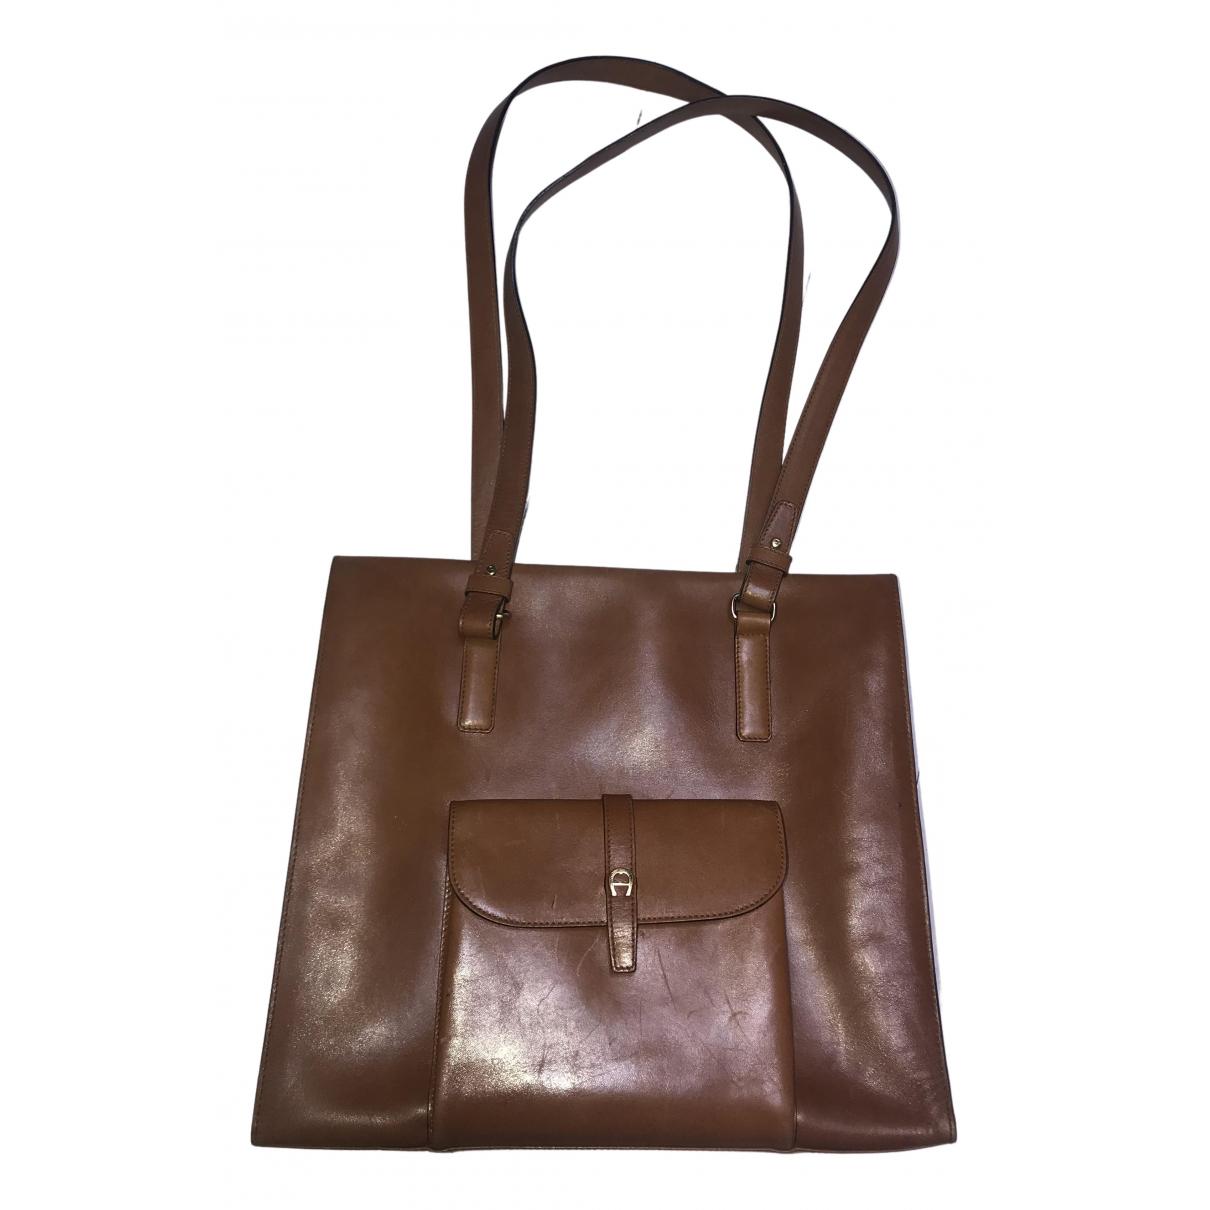 Aigner N Camel Leather handbag for Women N